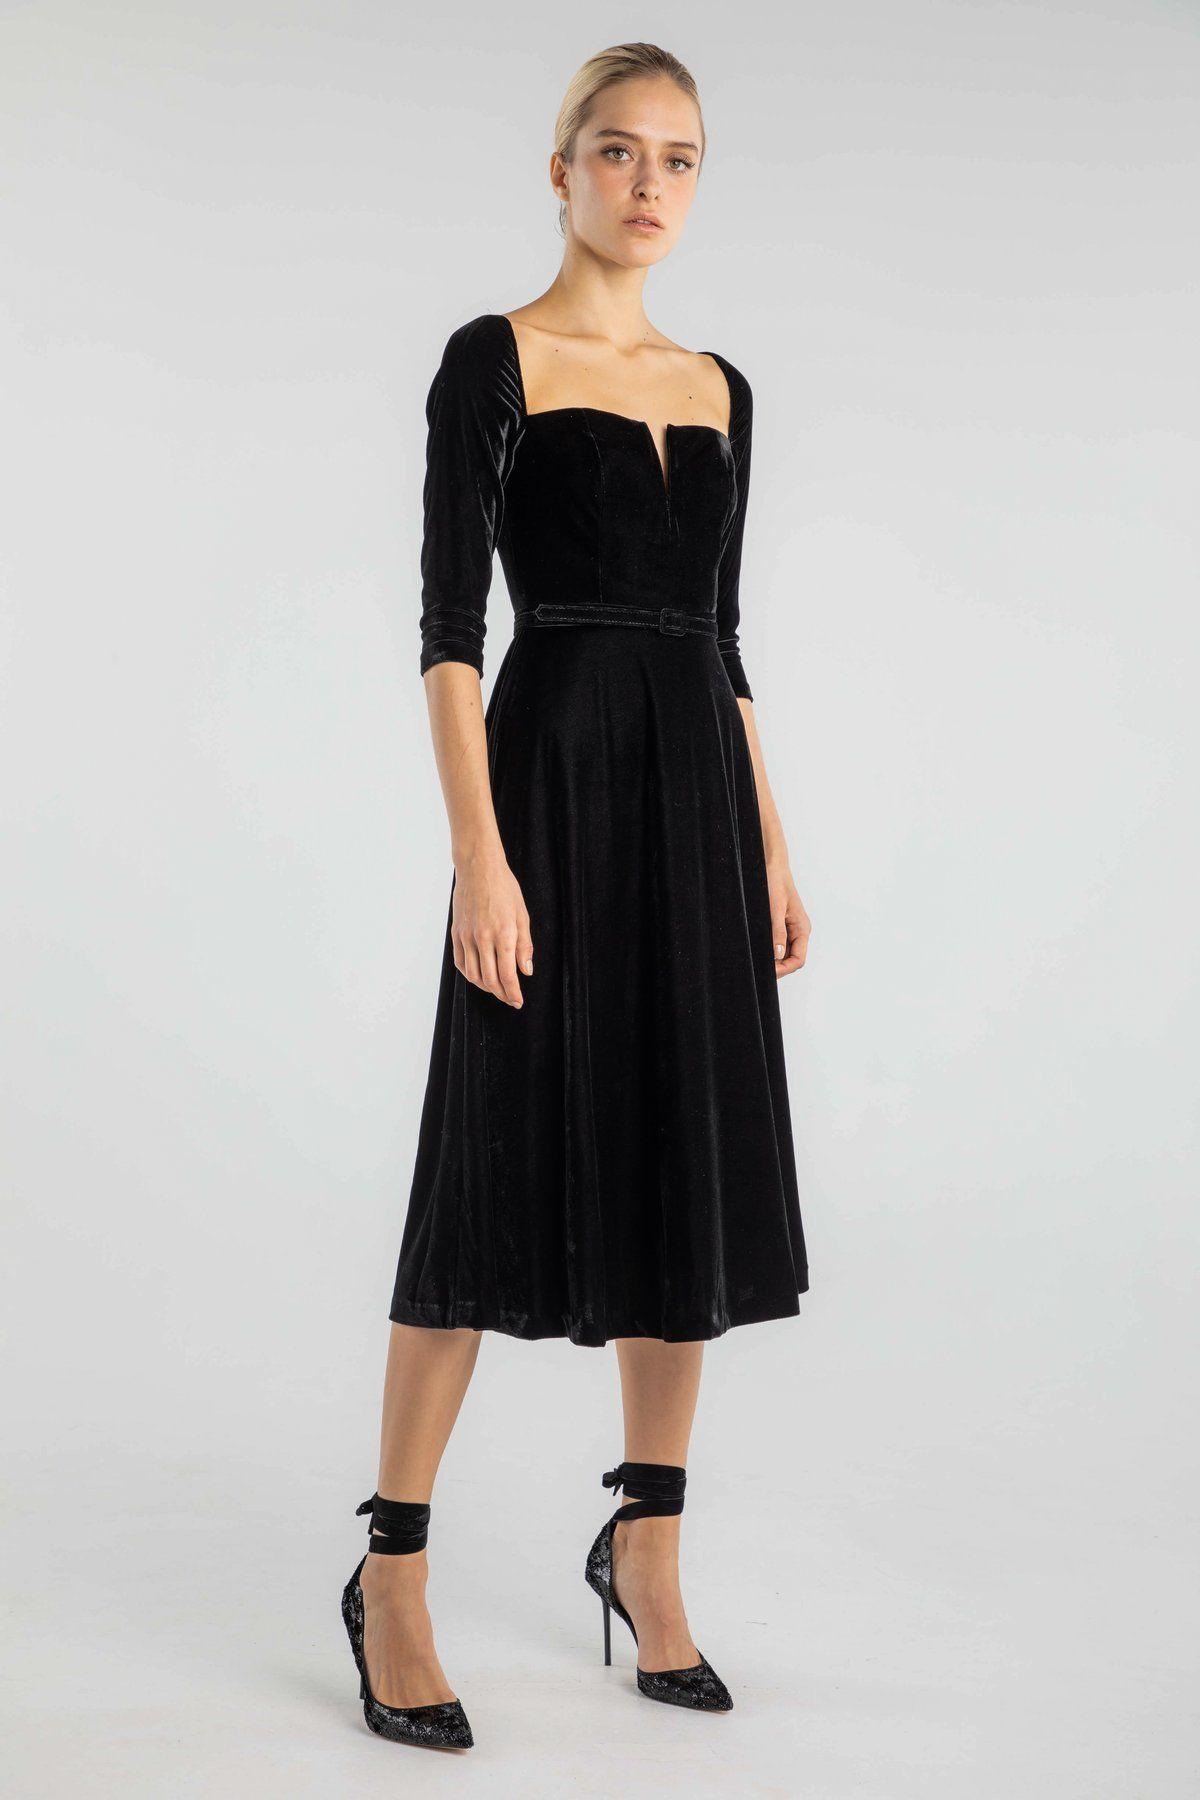 Description Elegant A Line Cocktail Dress With 3 4 Length Sleeves Plush Velvet Fabric Square Neckline With A Wi Velvet Midi Dress Dresses Necklines For Dresses [ 1800 x 1200 Pixel ]